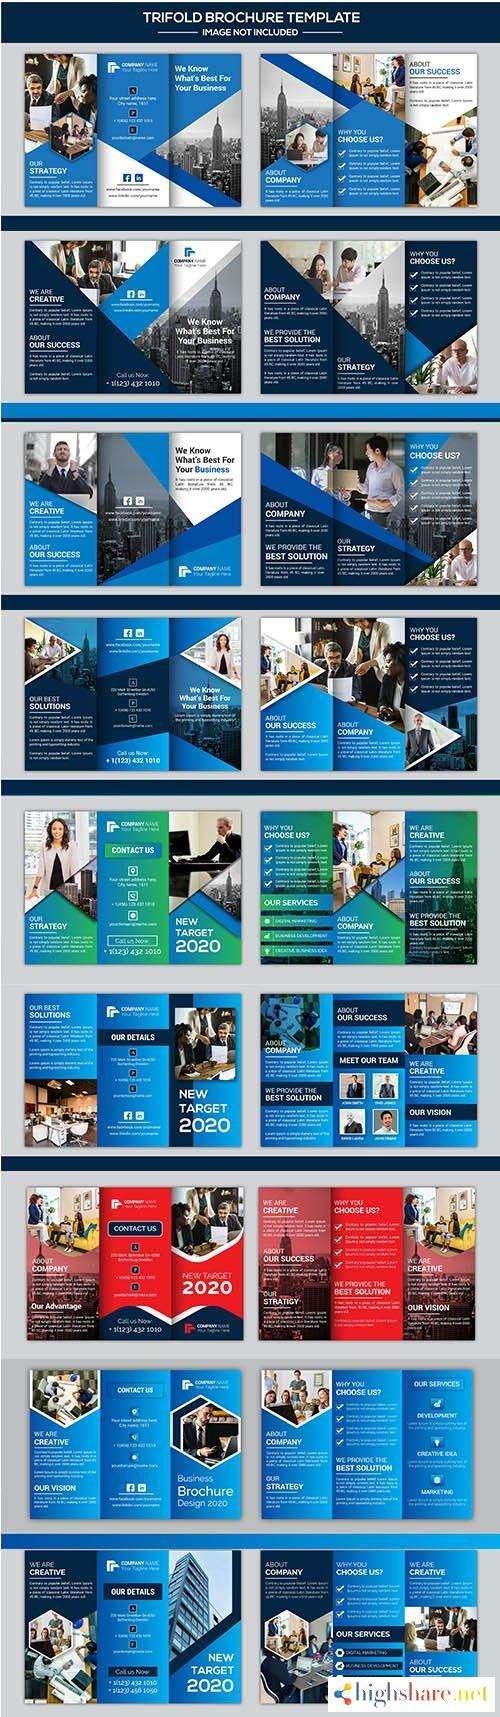 company business trifold brochure set 5f41f16c19e34 - Company Business Trifold Brochure Set